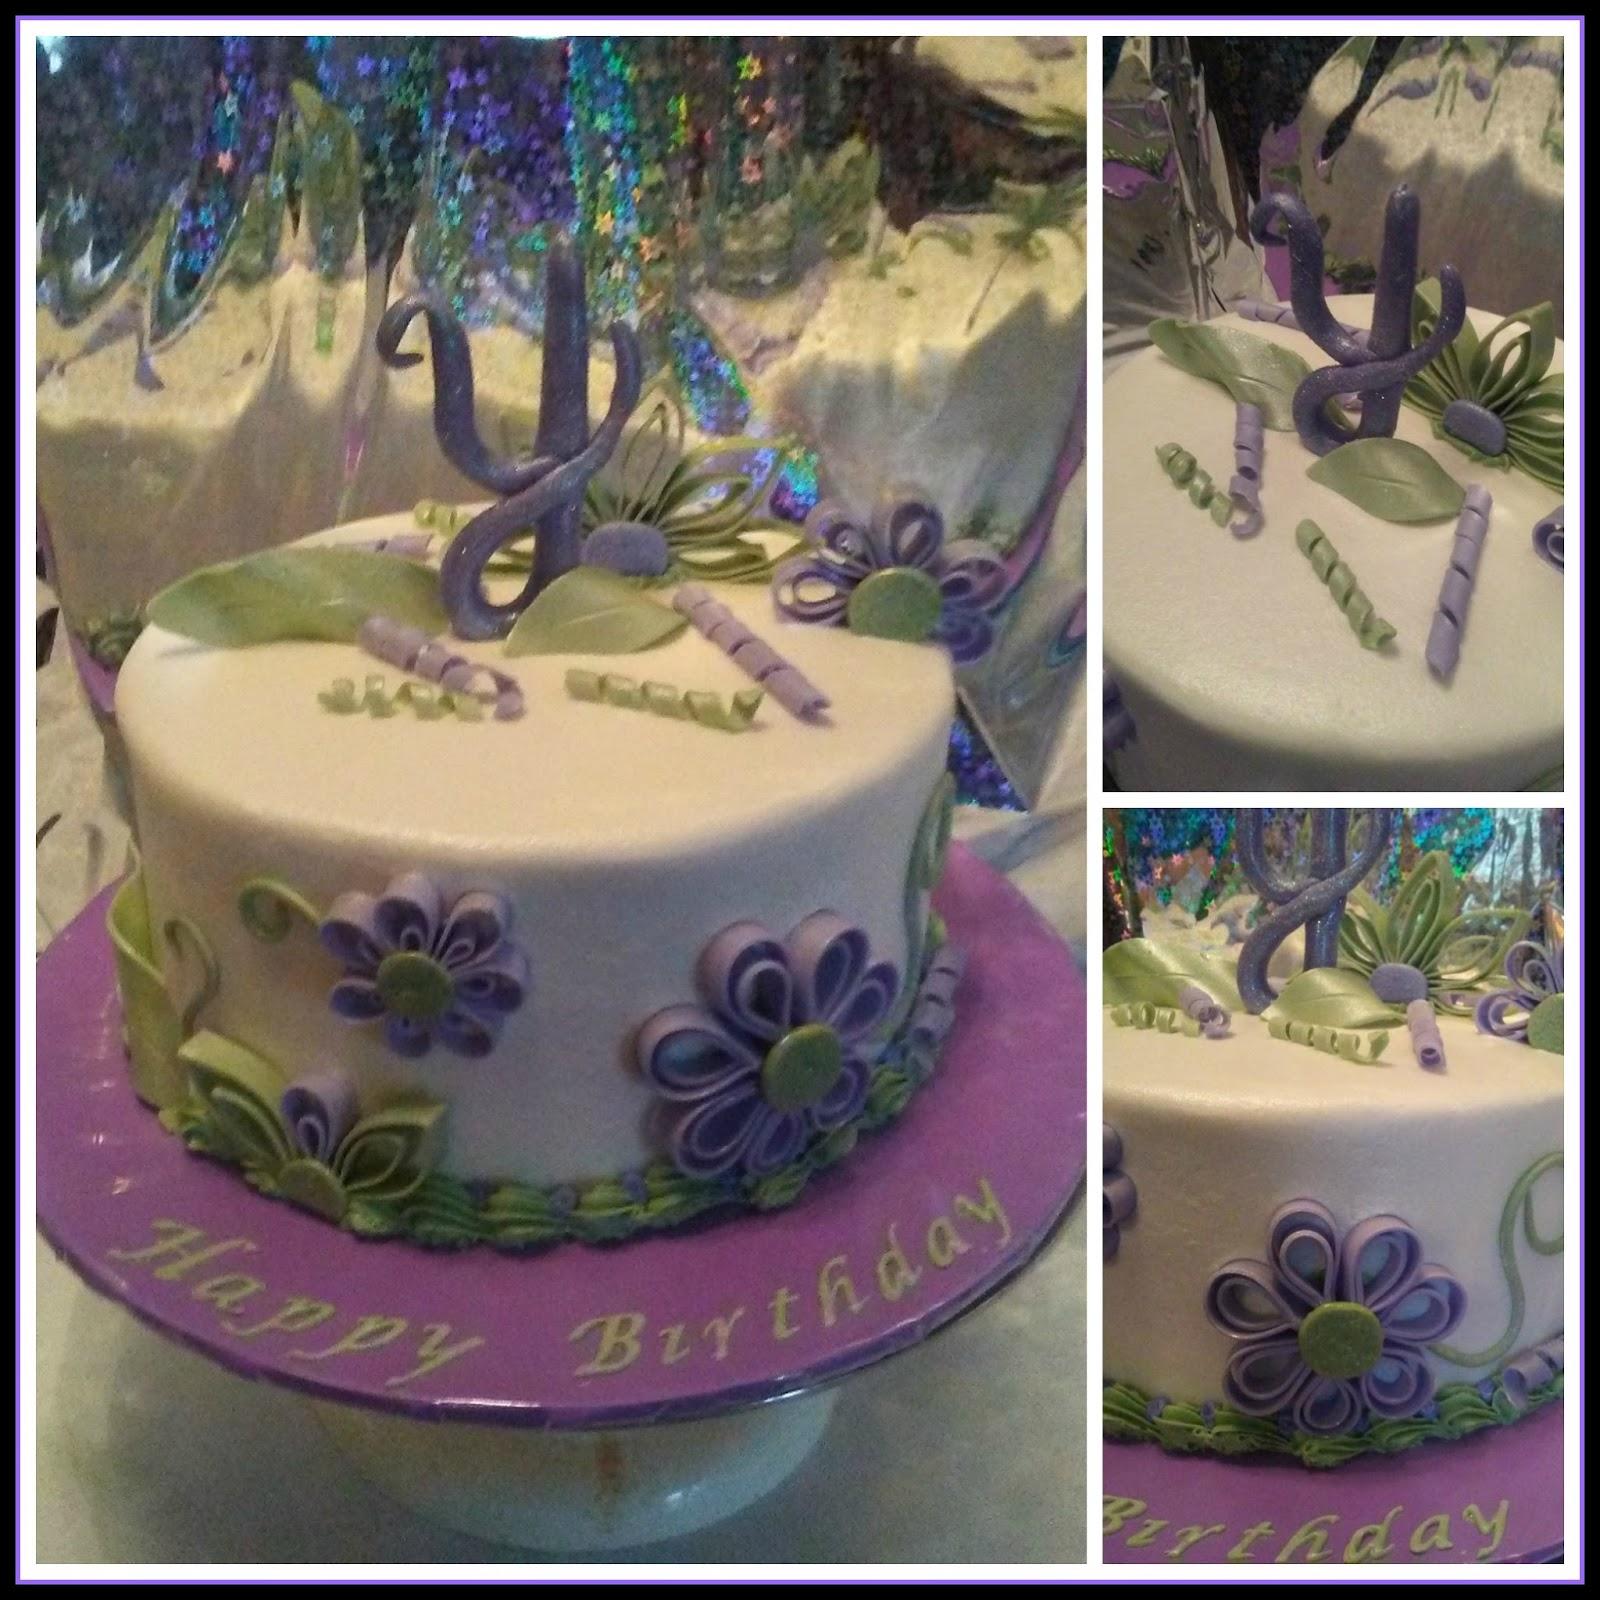 Cakes By Cindi Schultz